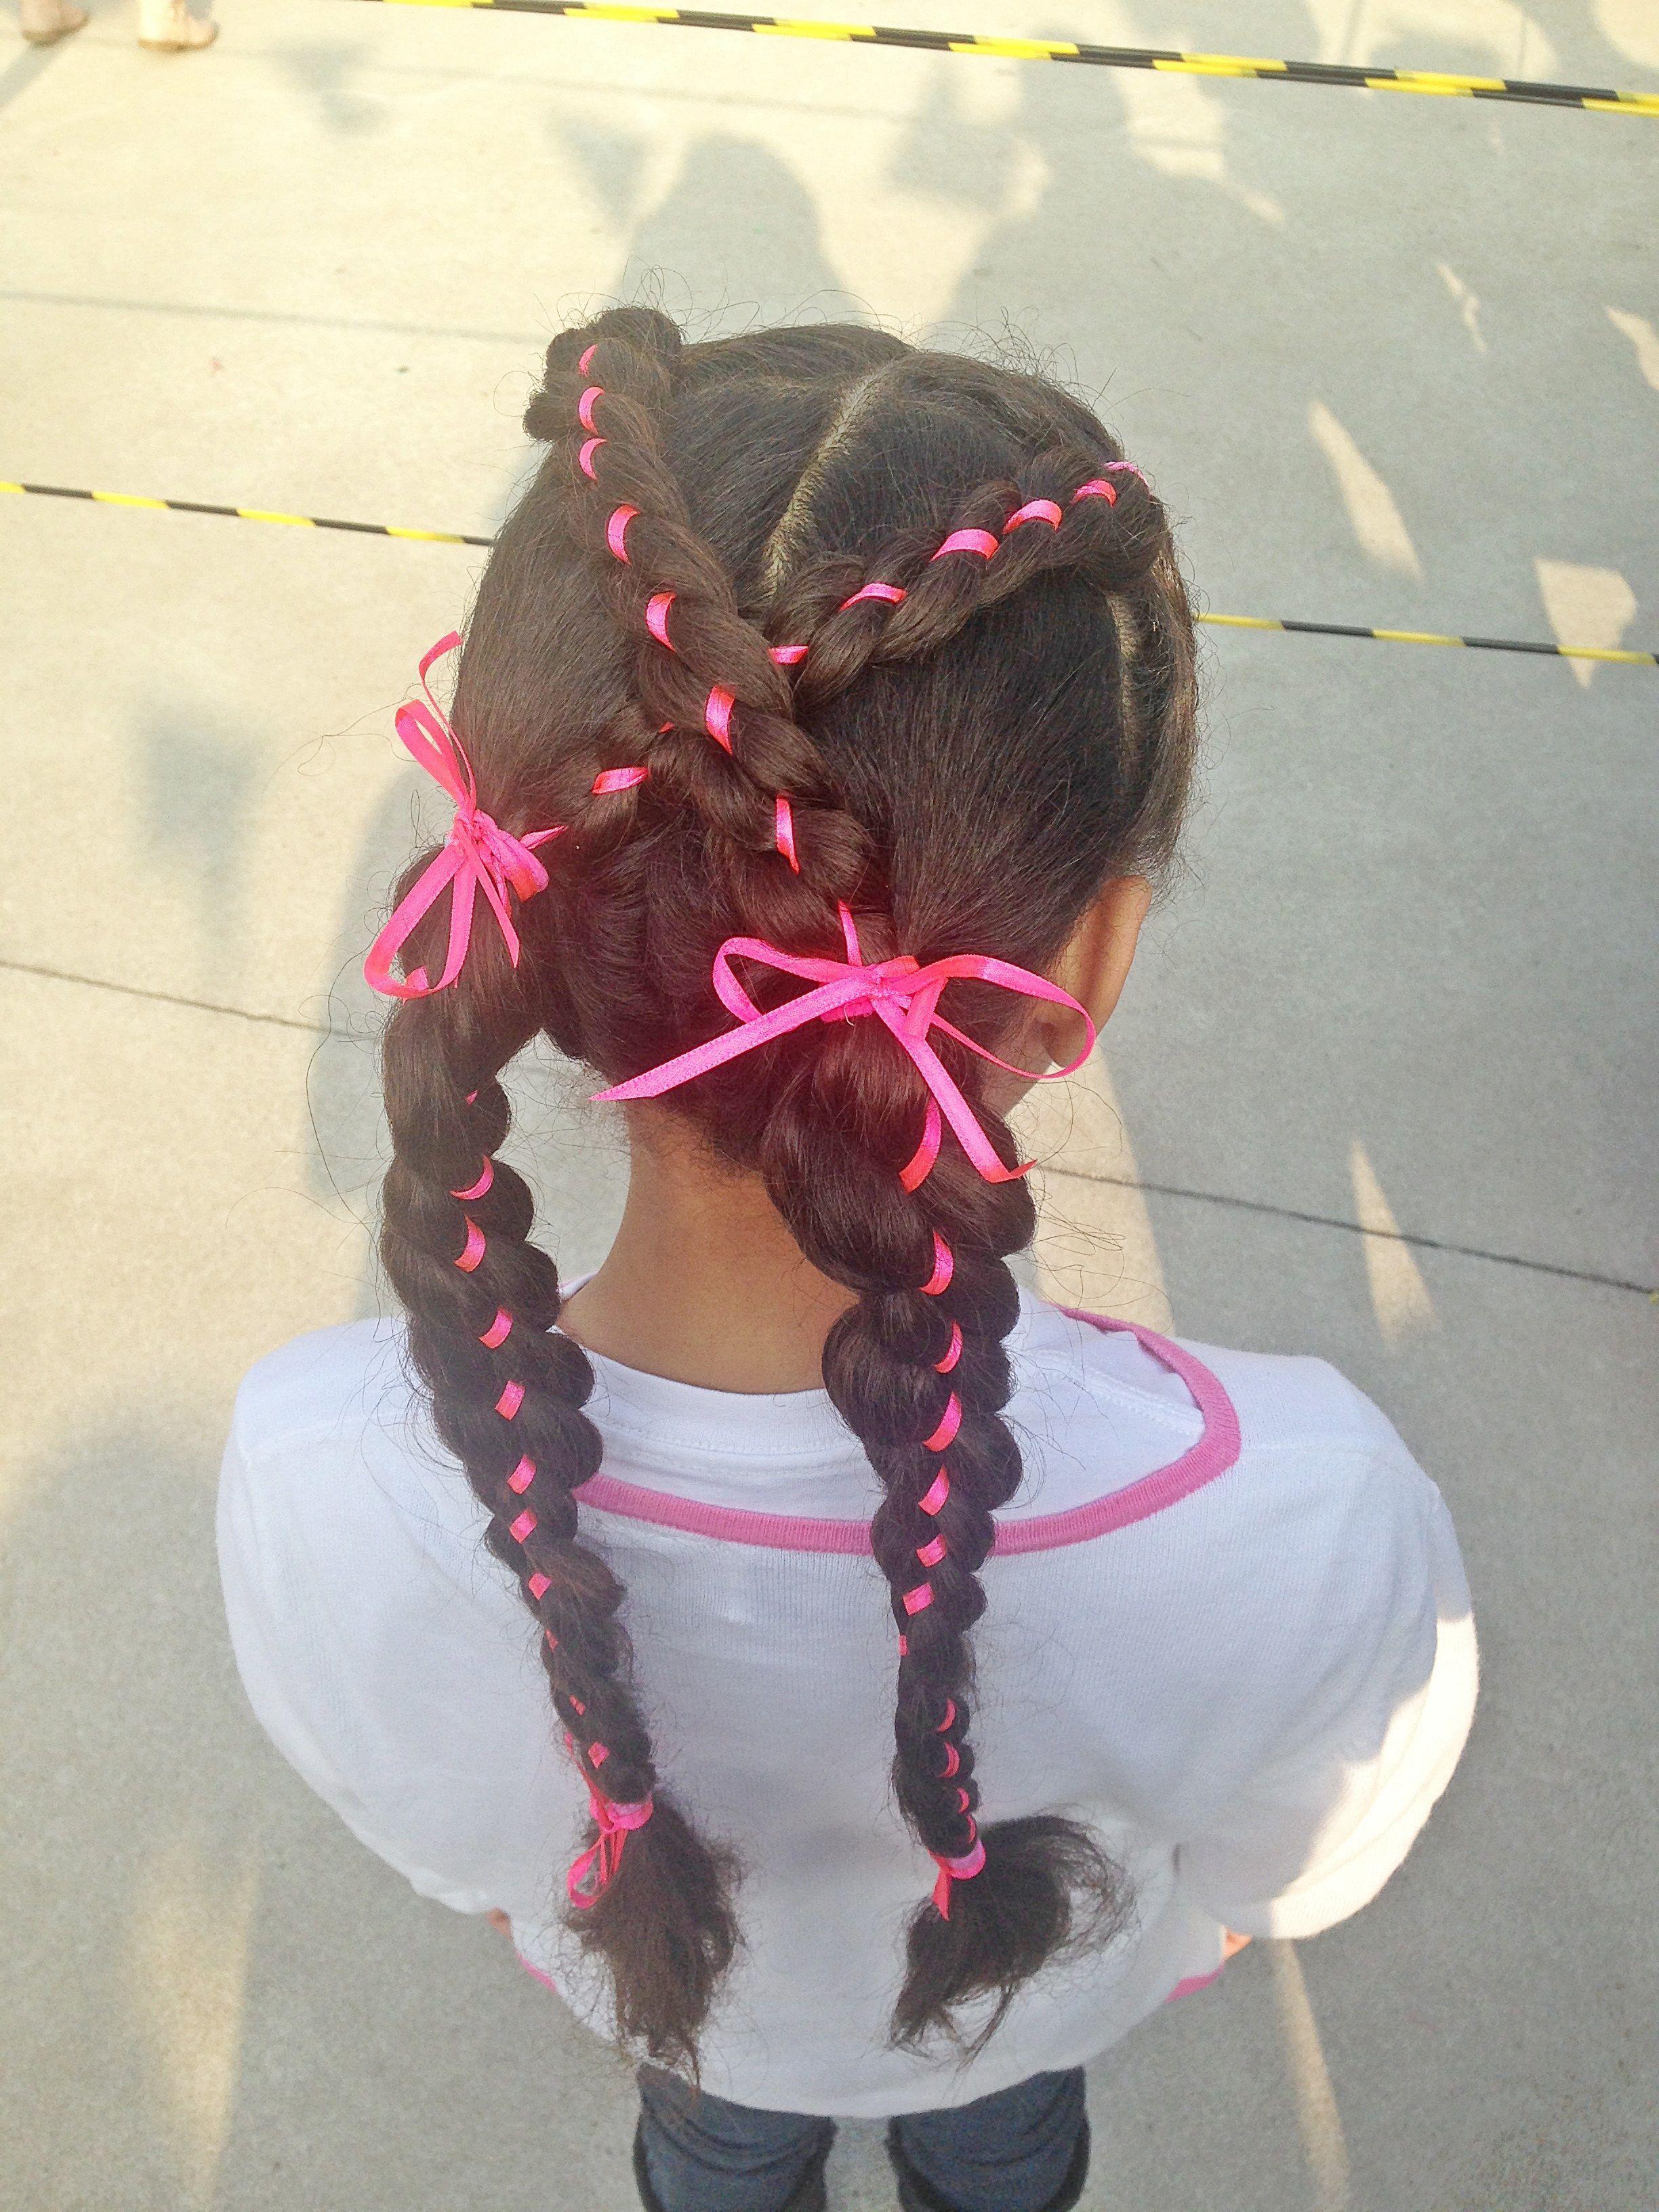 Penteado infantil com fitas penteadoinfantil penteado hairstyle